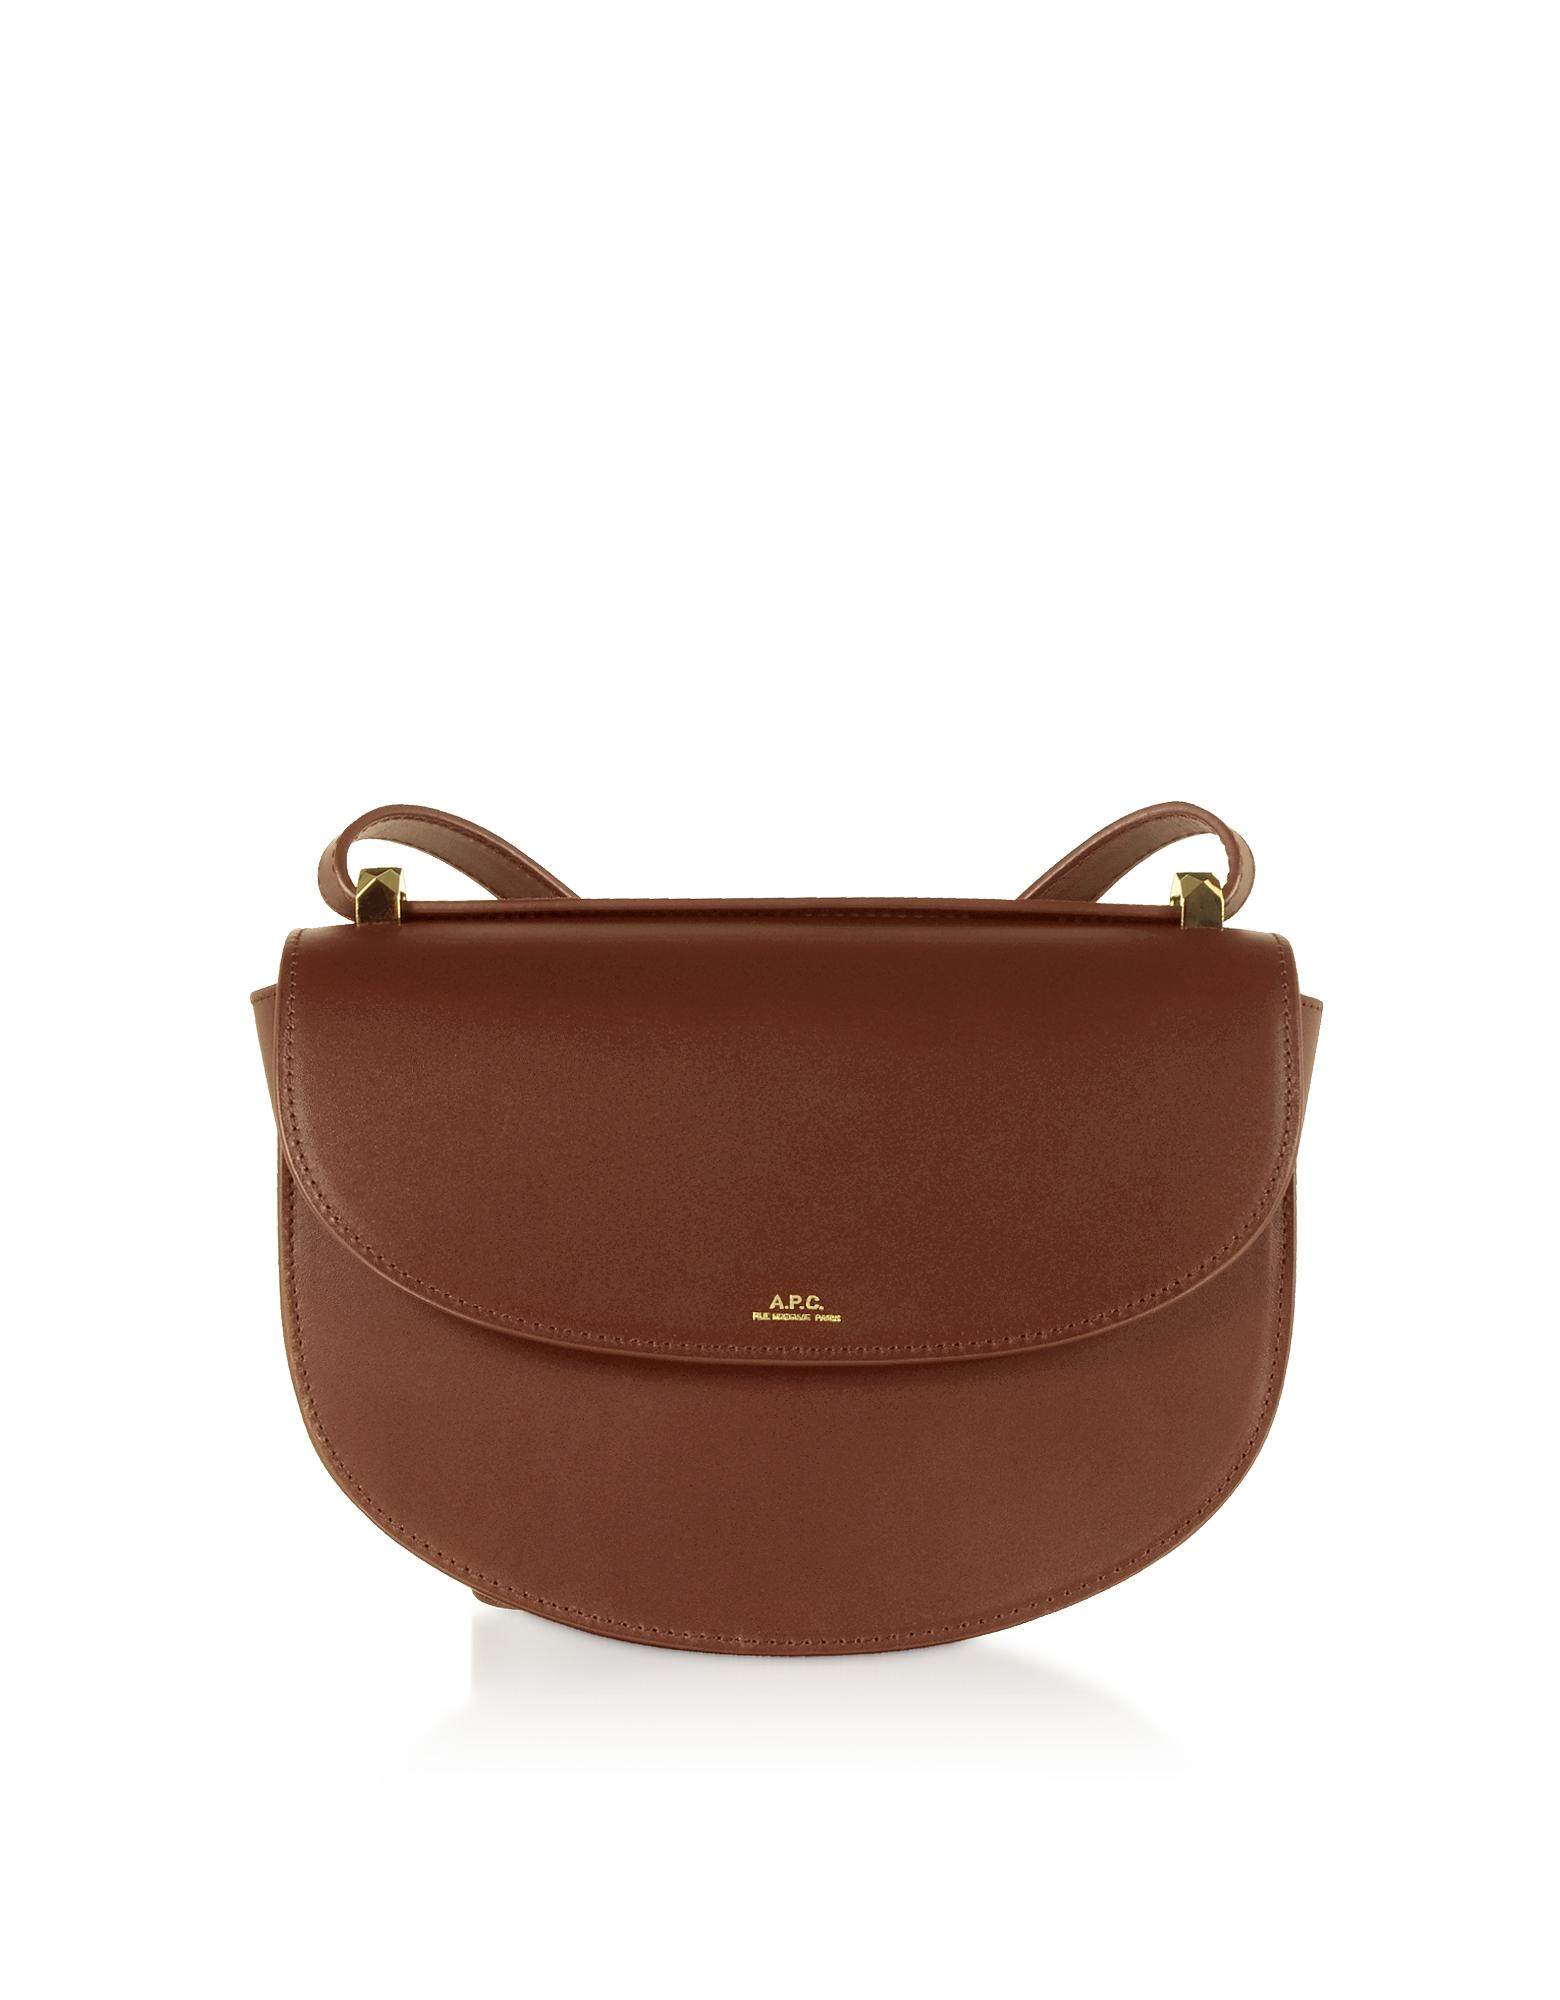 A.P.C. Designer Handbags, Hazel Geneve Leather Crossbody Bag